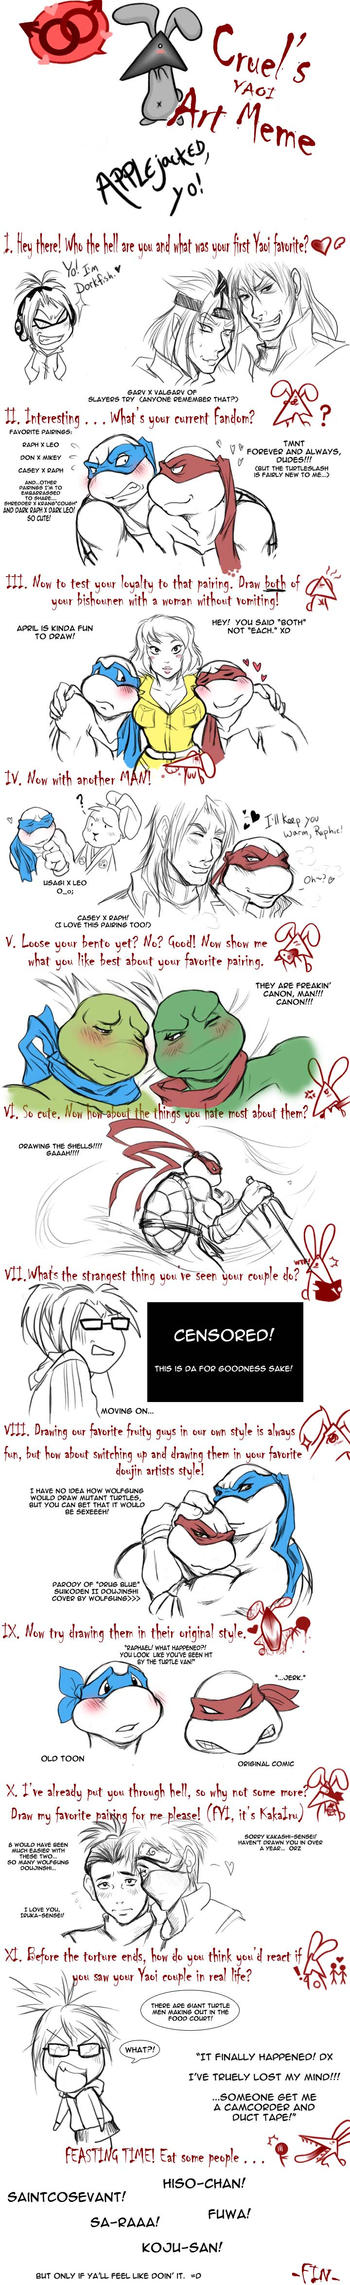 TMNT:  YAOI art meme by applejack